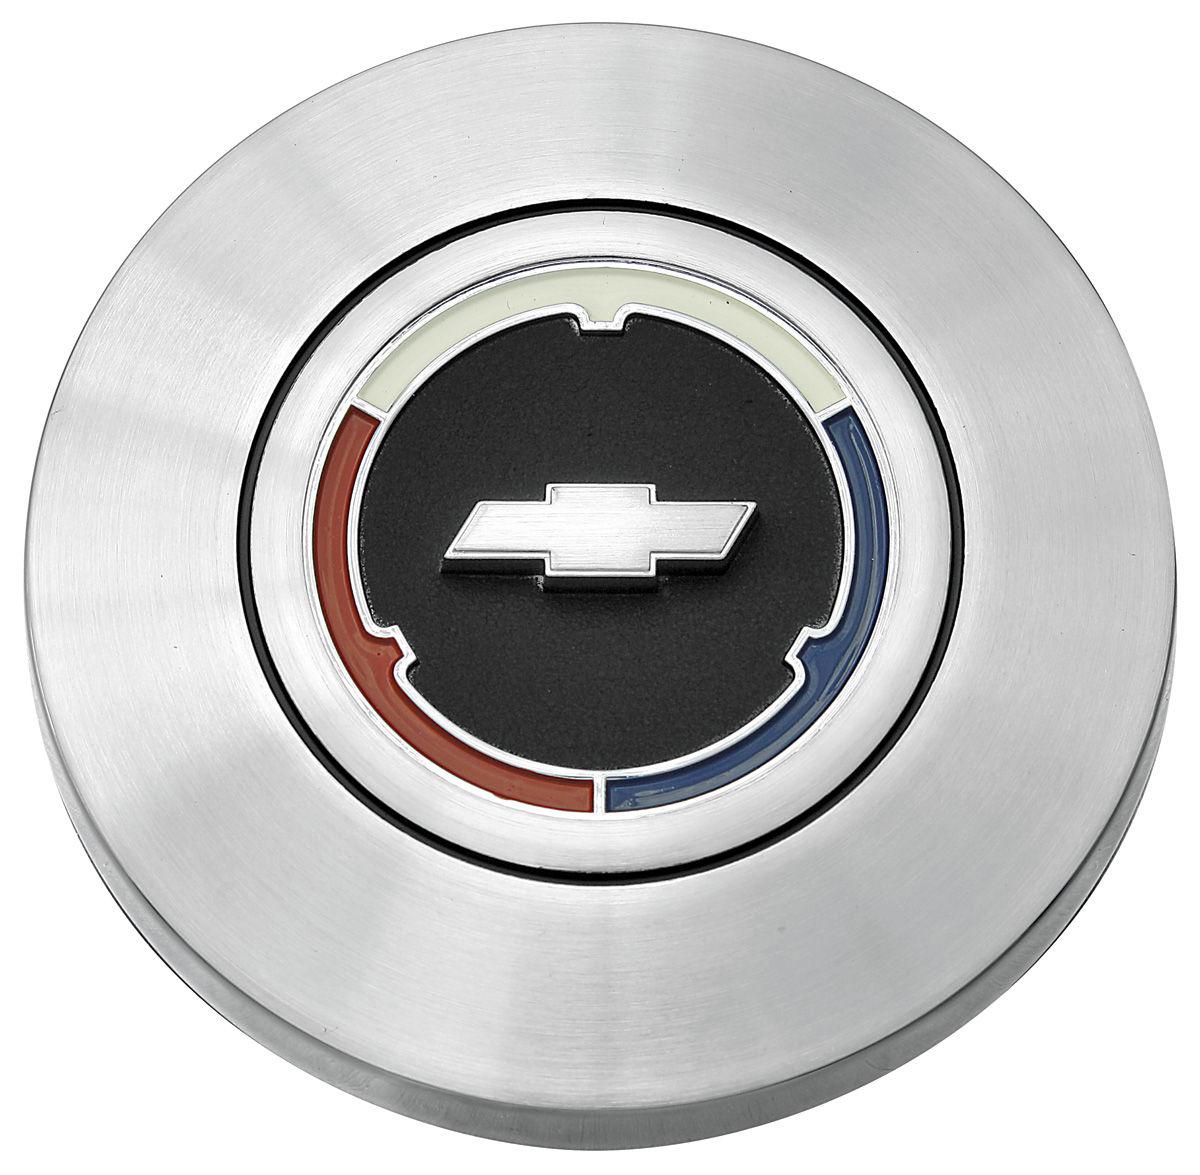 Photo of Horn Center Cap, Reproduction Bowtie, wood wheel